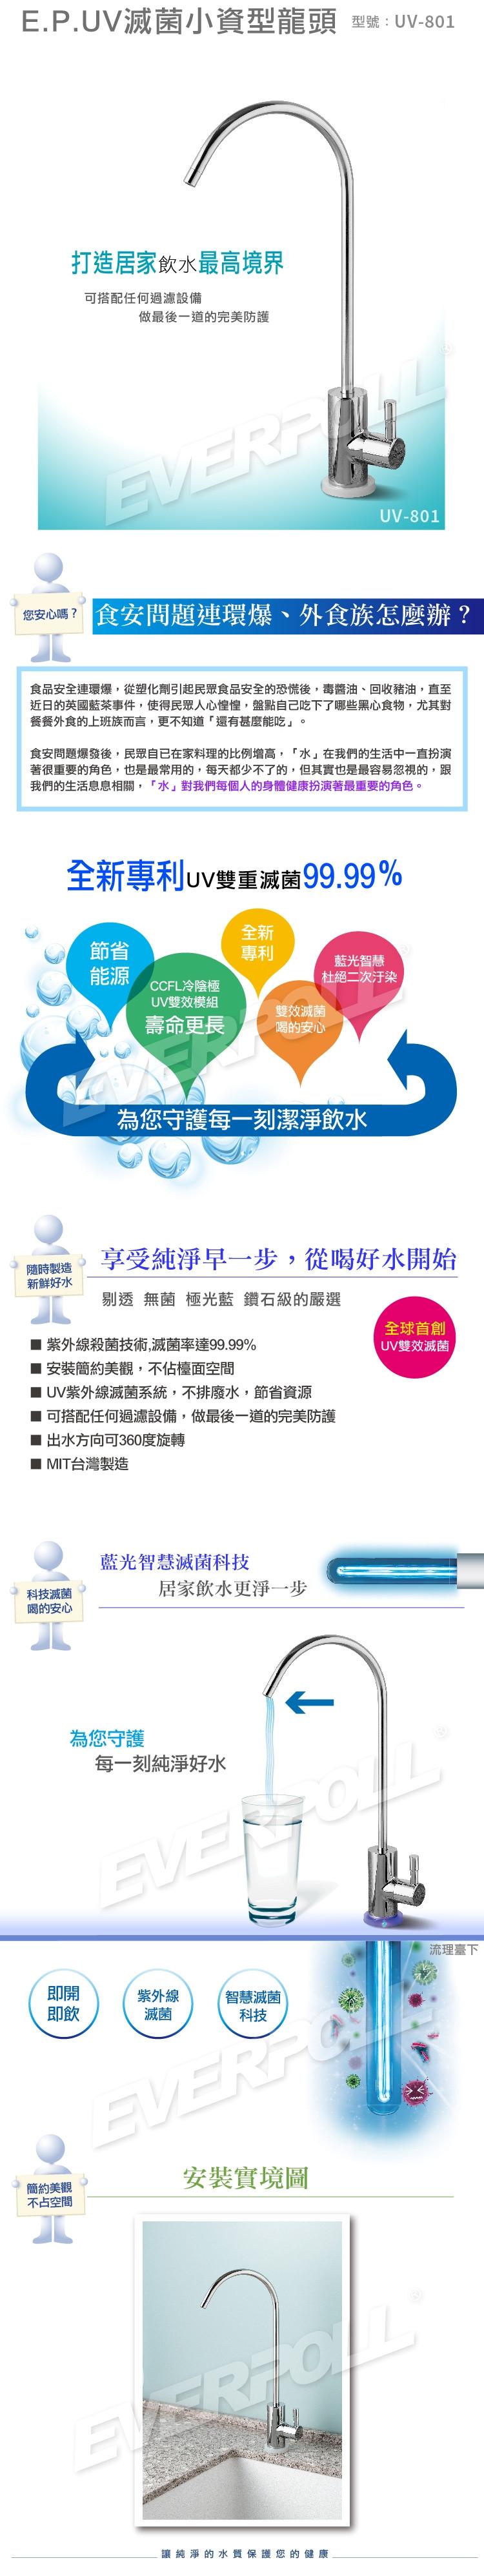 EVERPOLL愛惠浦 UV滅菌小資型龍頭 UV-801